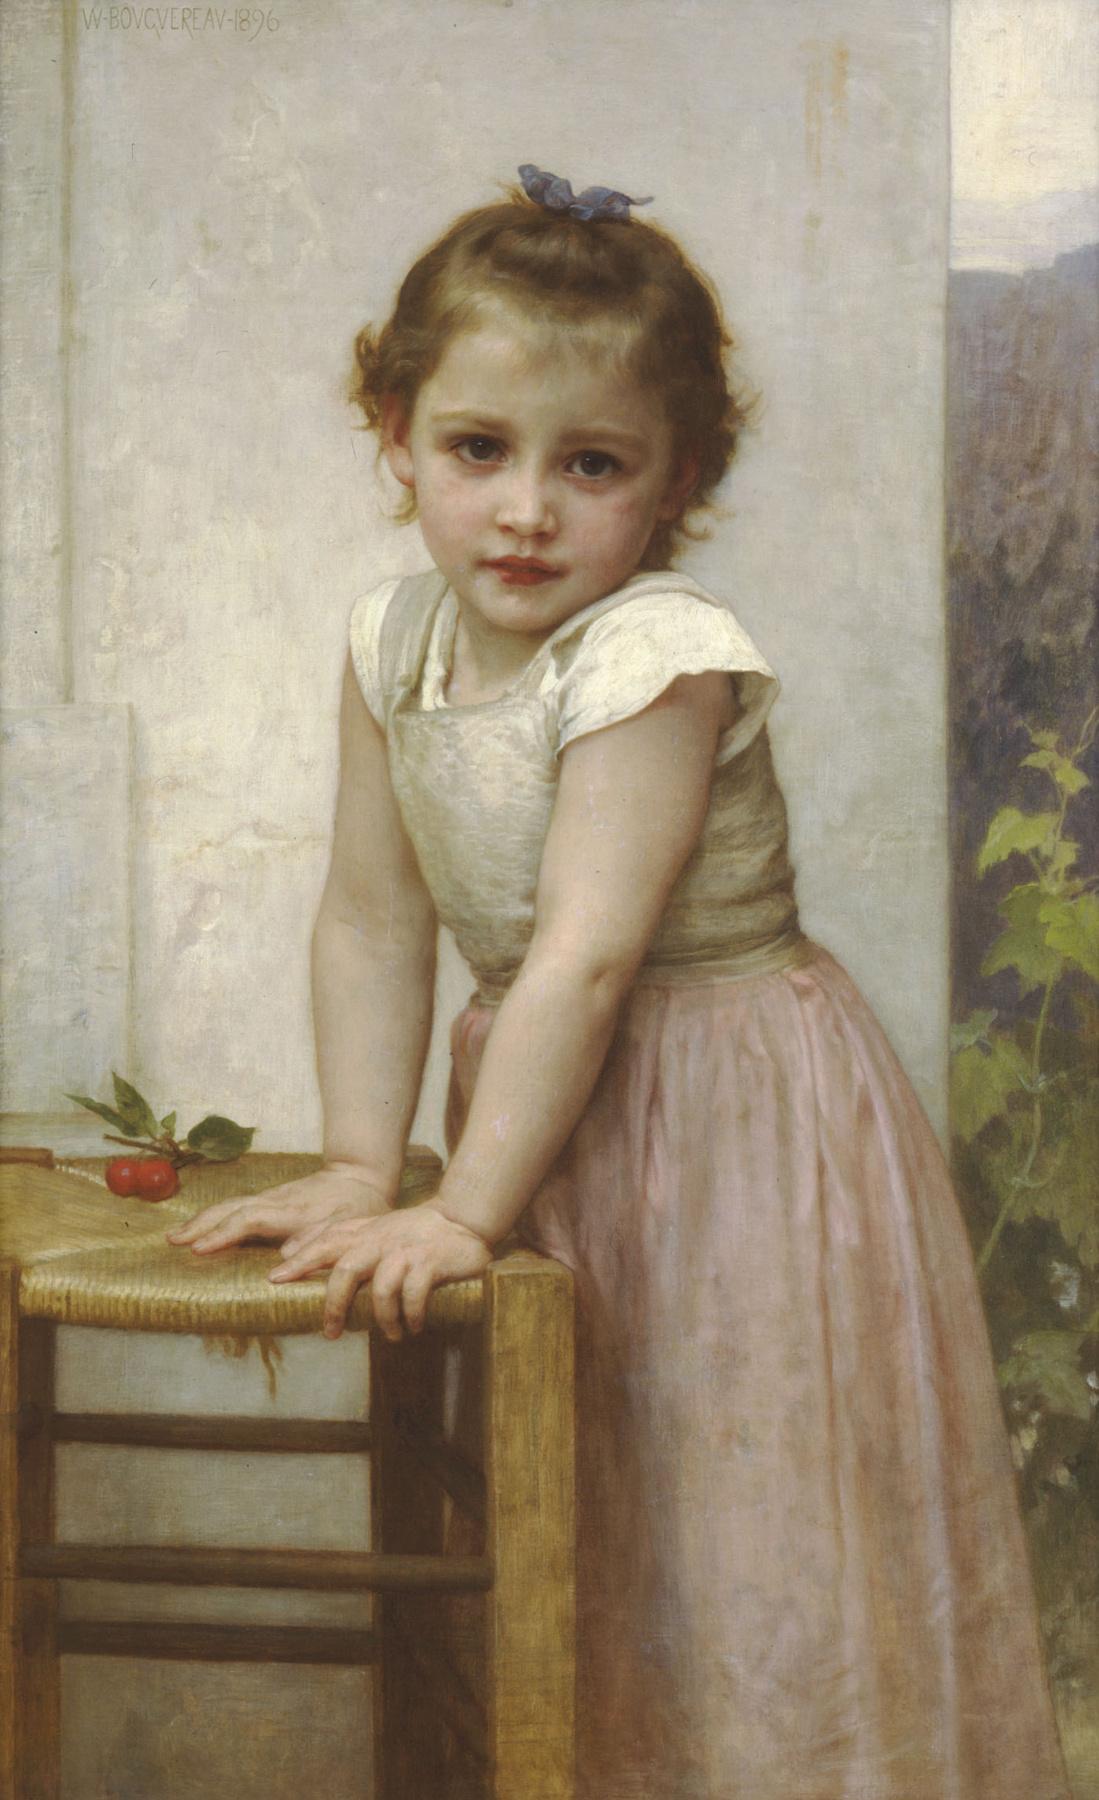 William-Adolphe Bouguereau. Yvonne